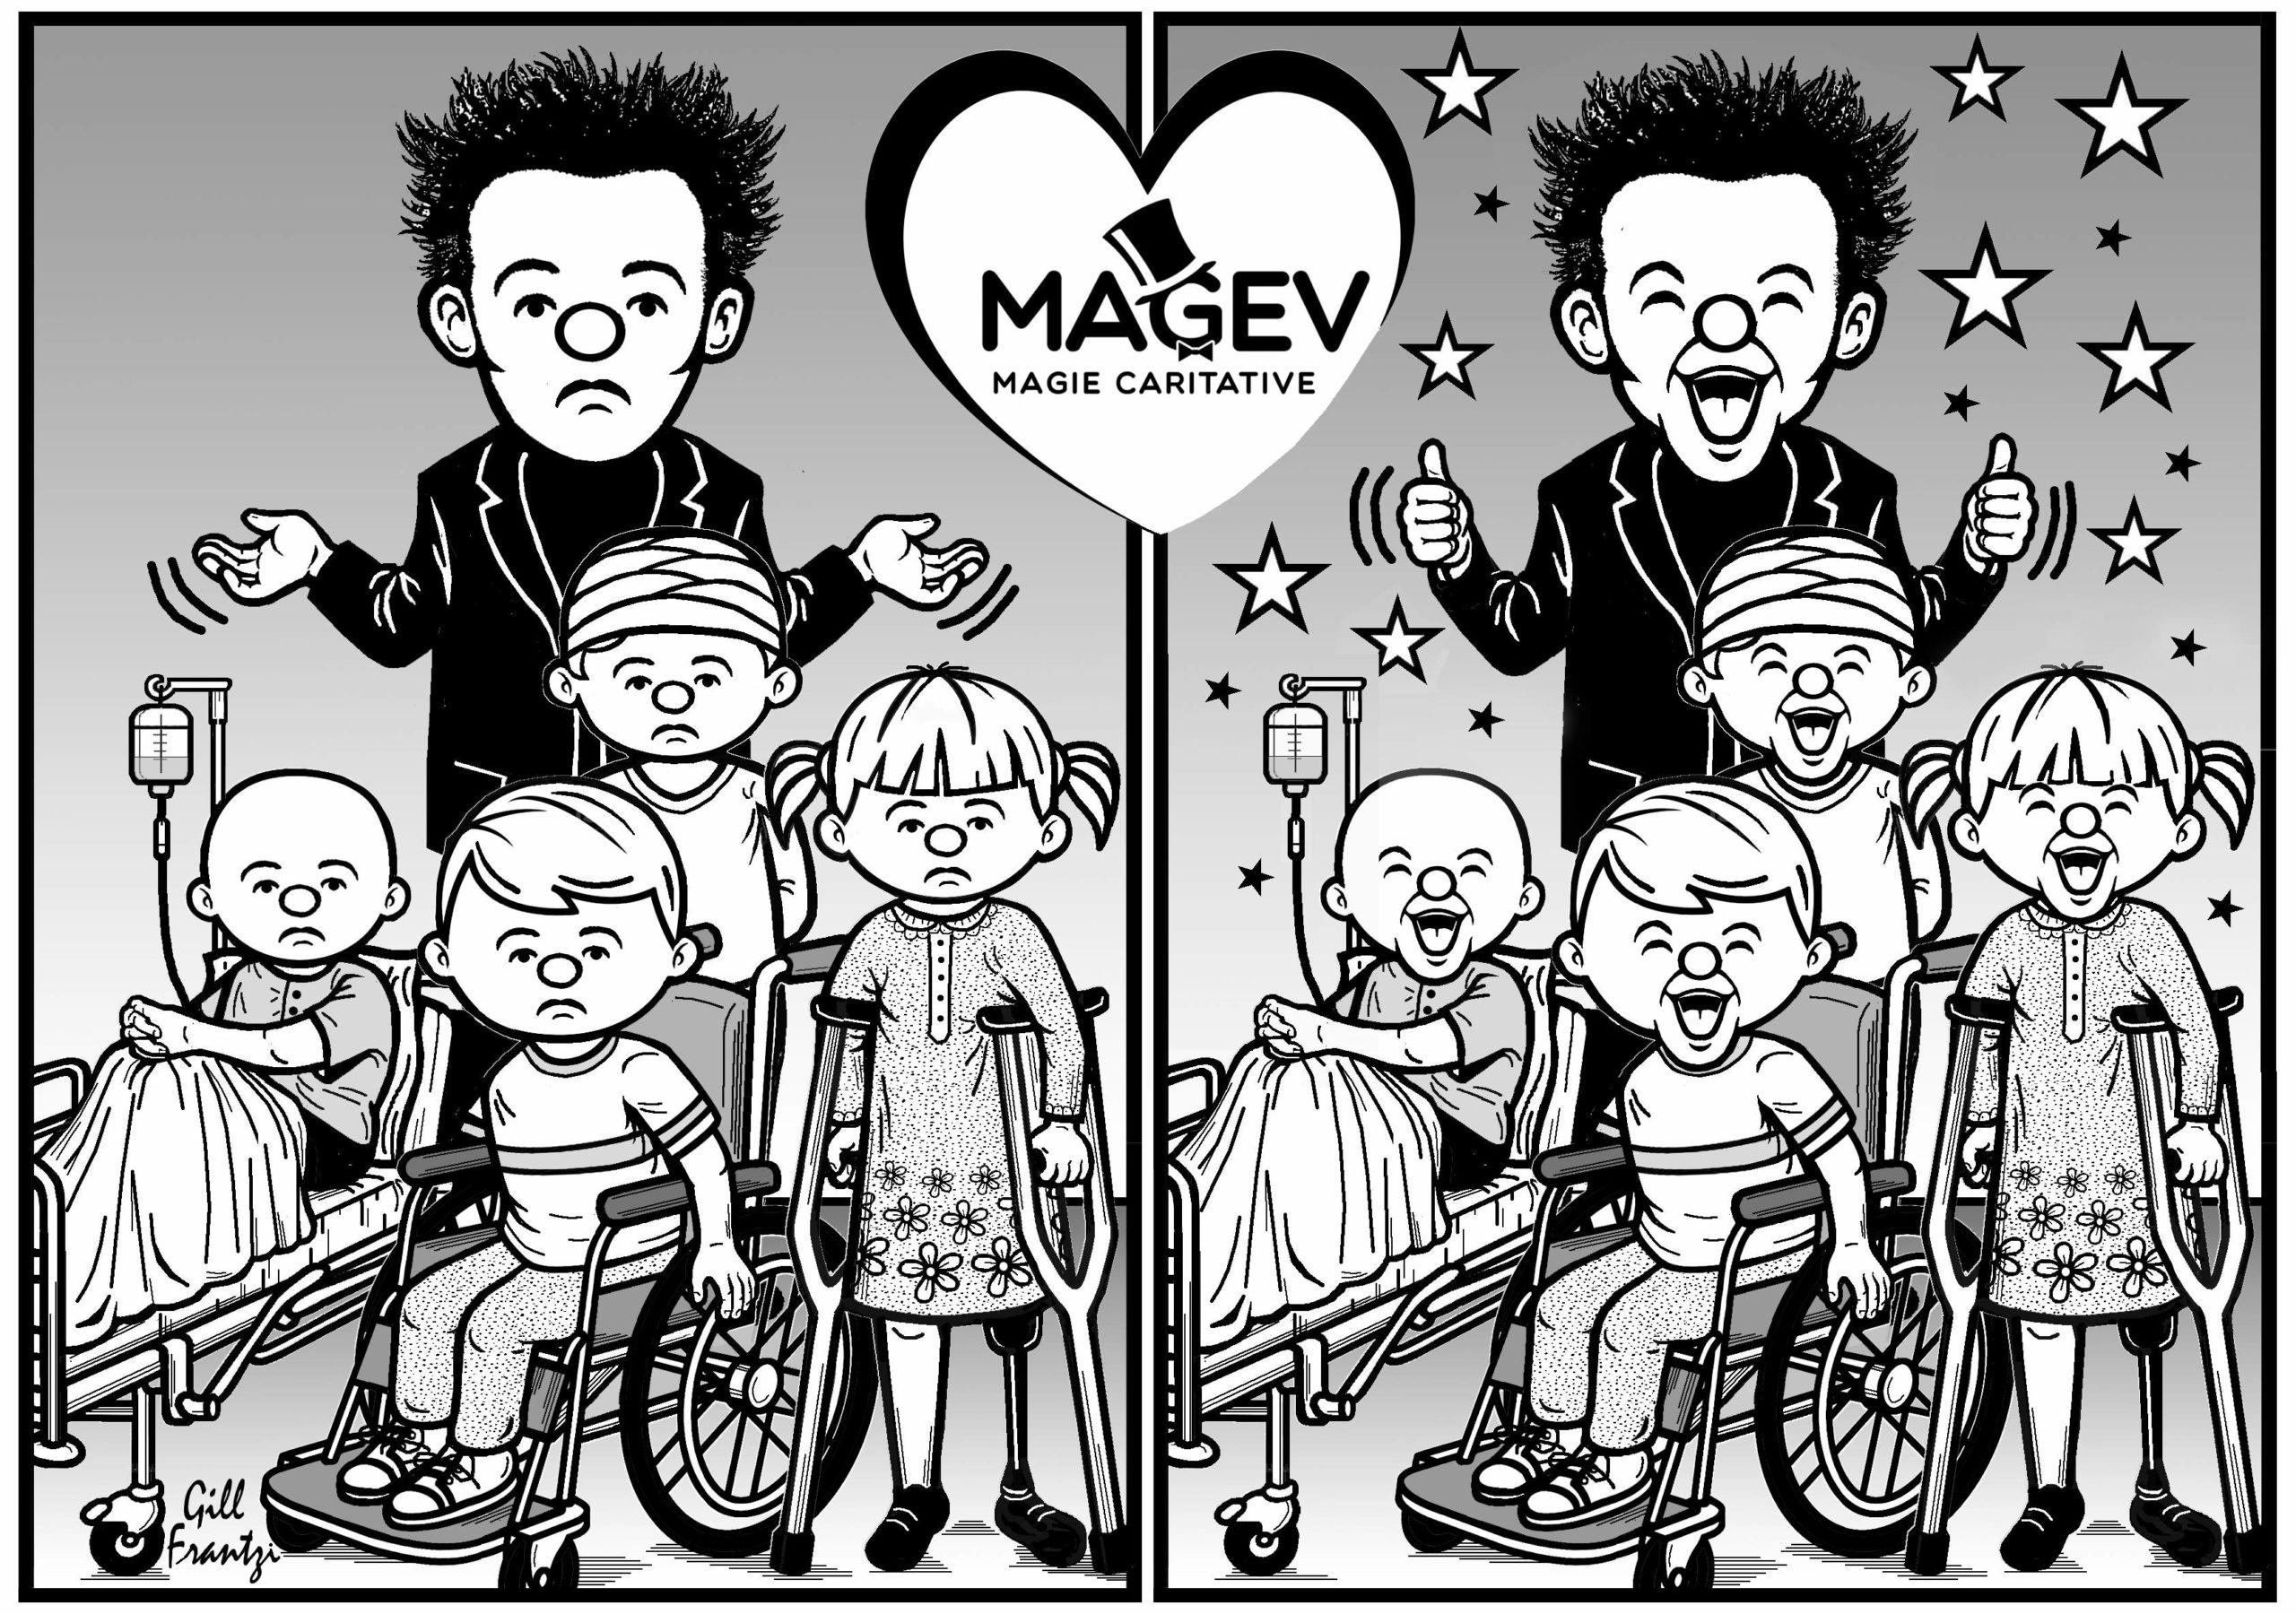 Association Magev Caritatif